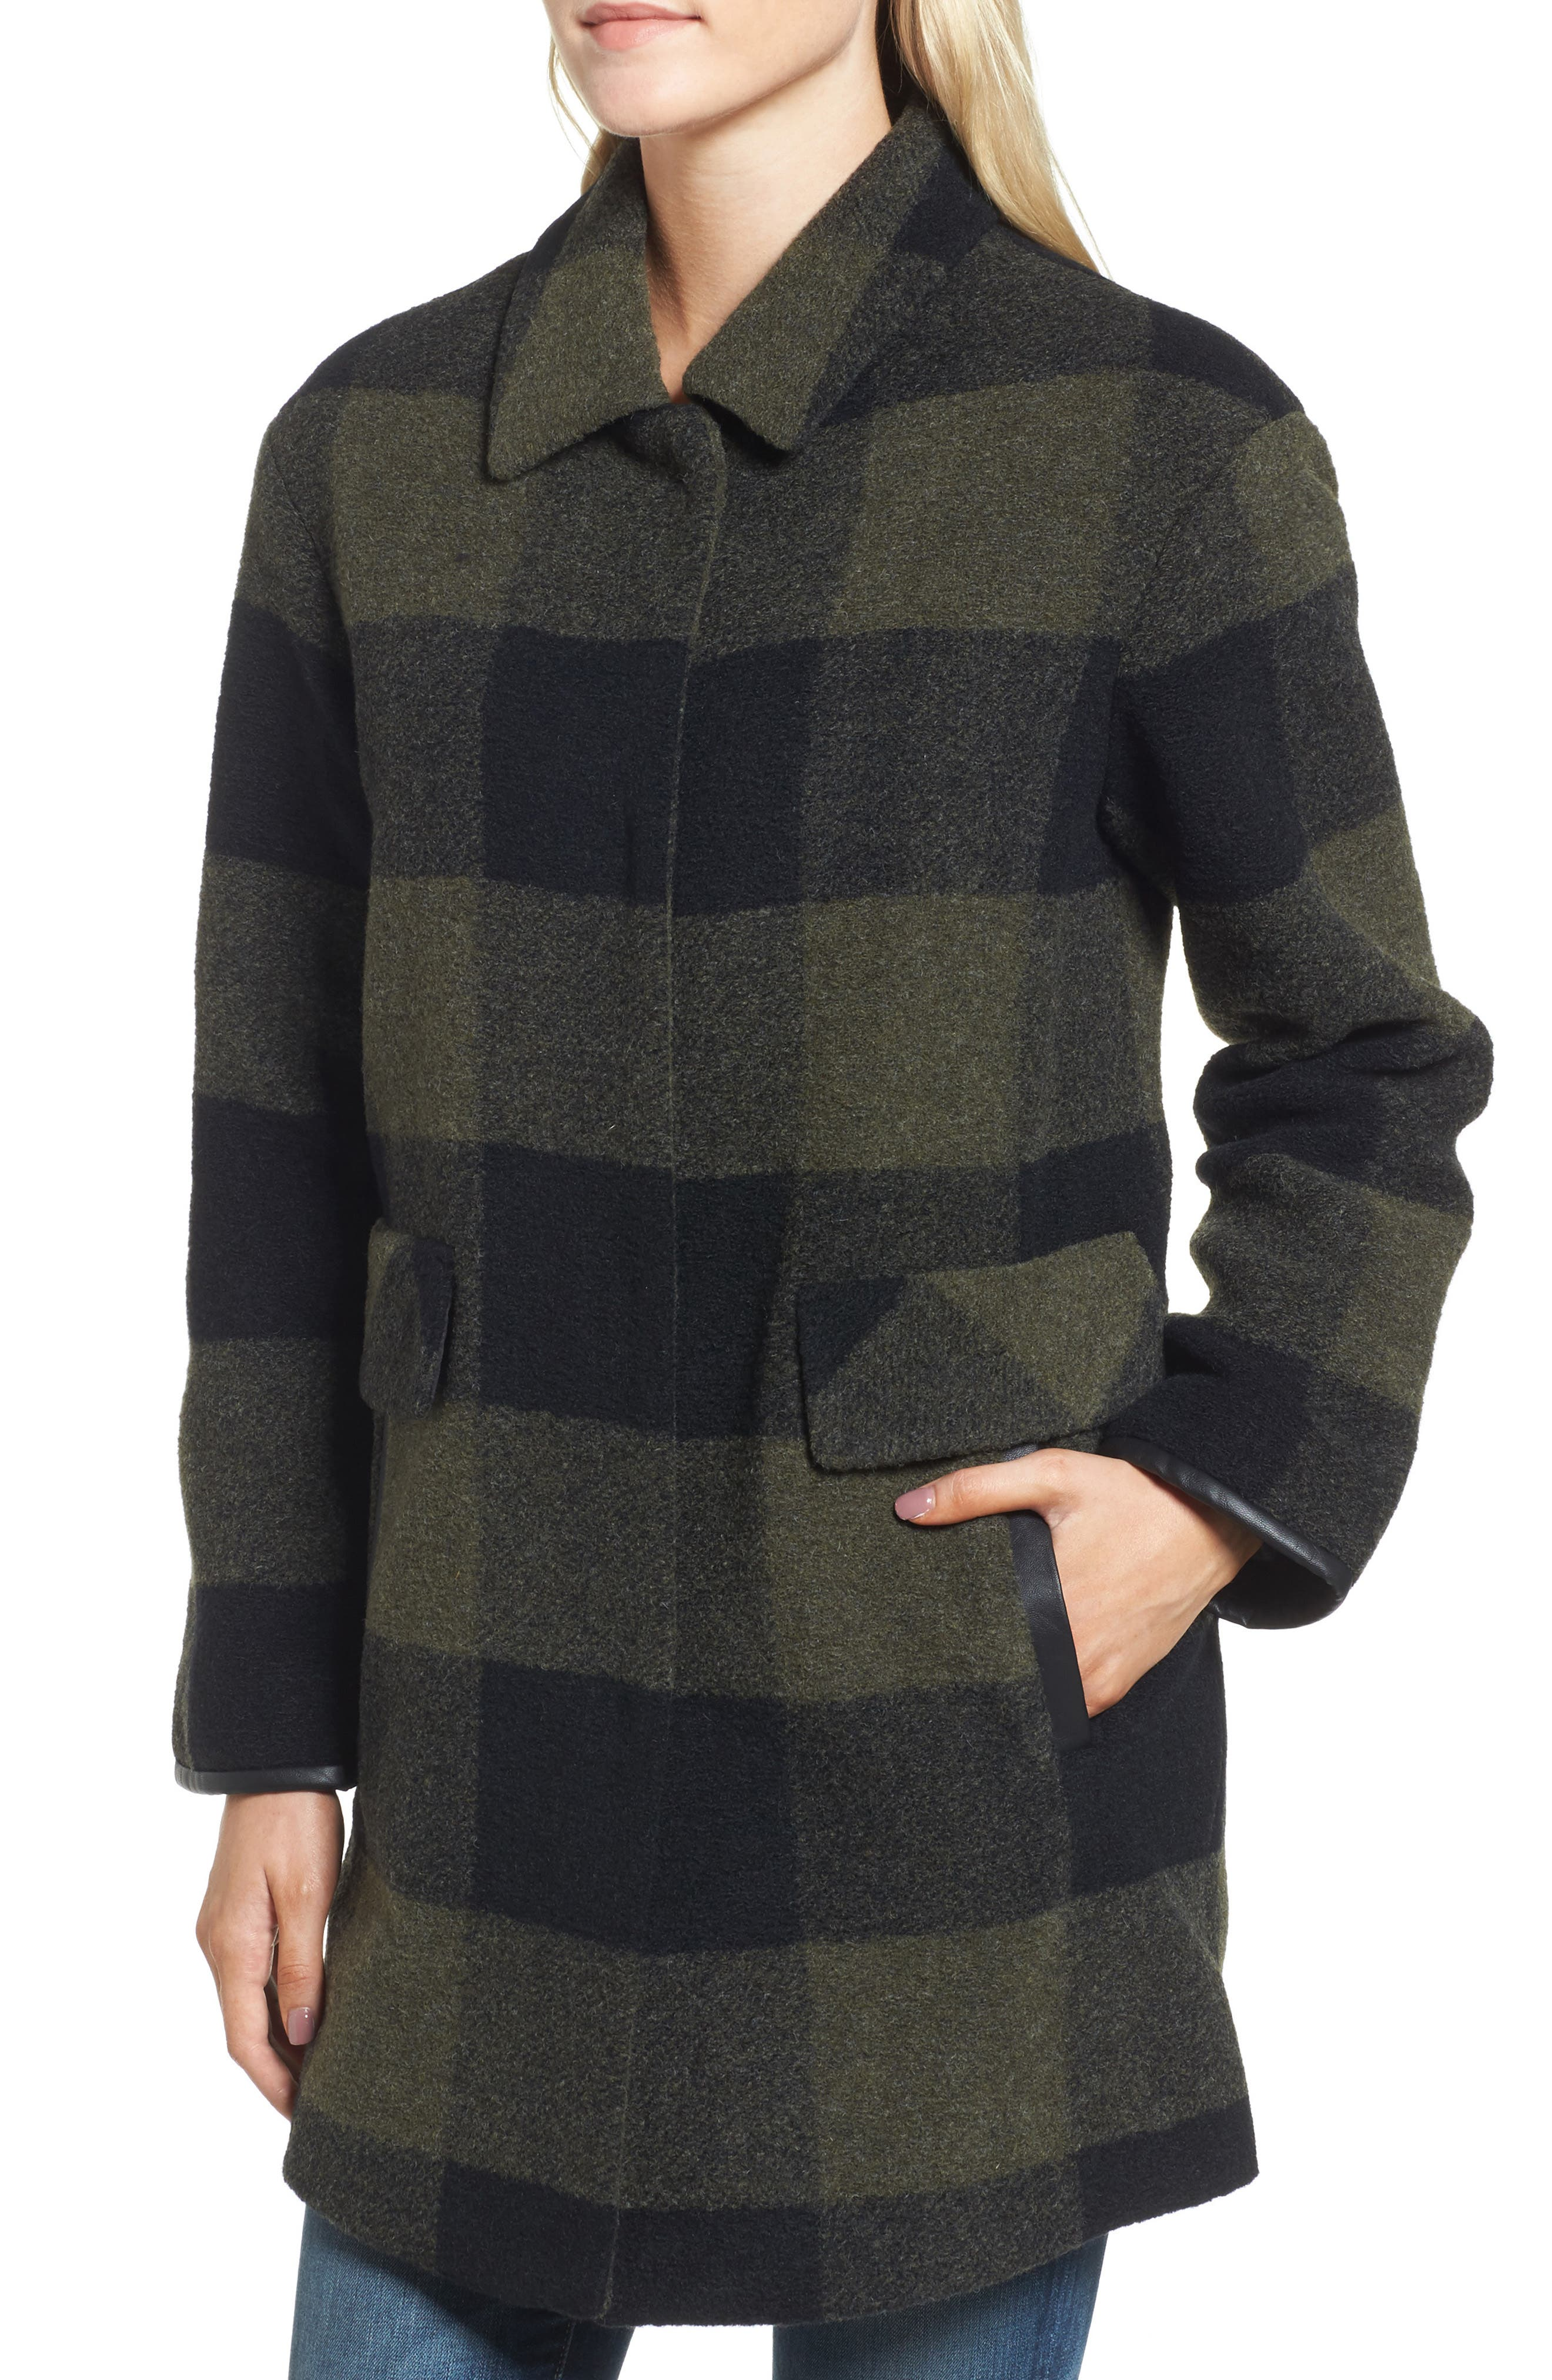 Paul Bunyan Plaid Wool Blend Barn Coat,                             Alternate thumbnail 4, color,                             Olive/ Black Plaid